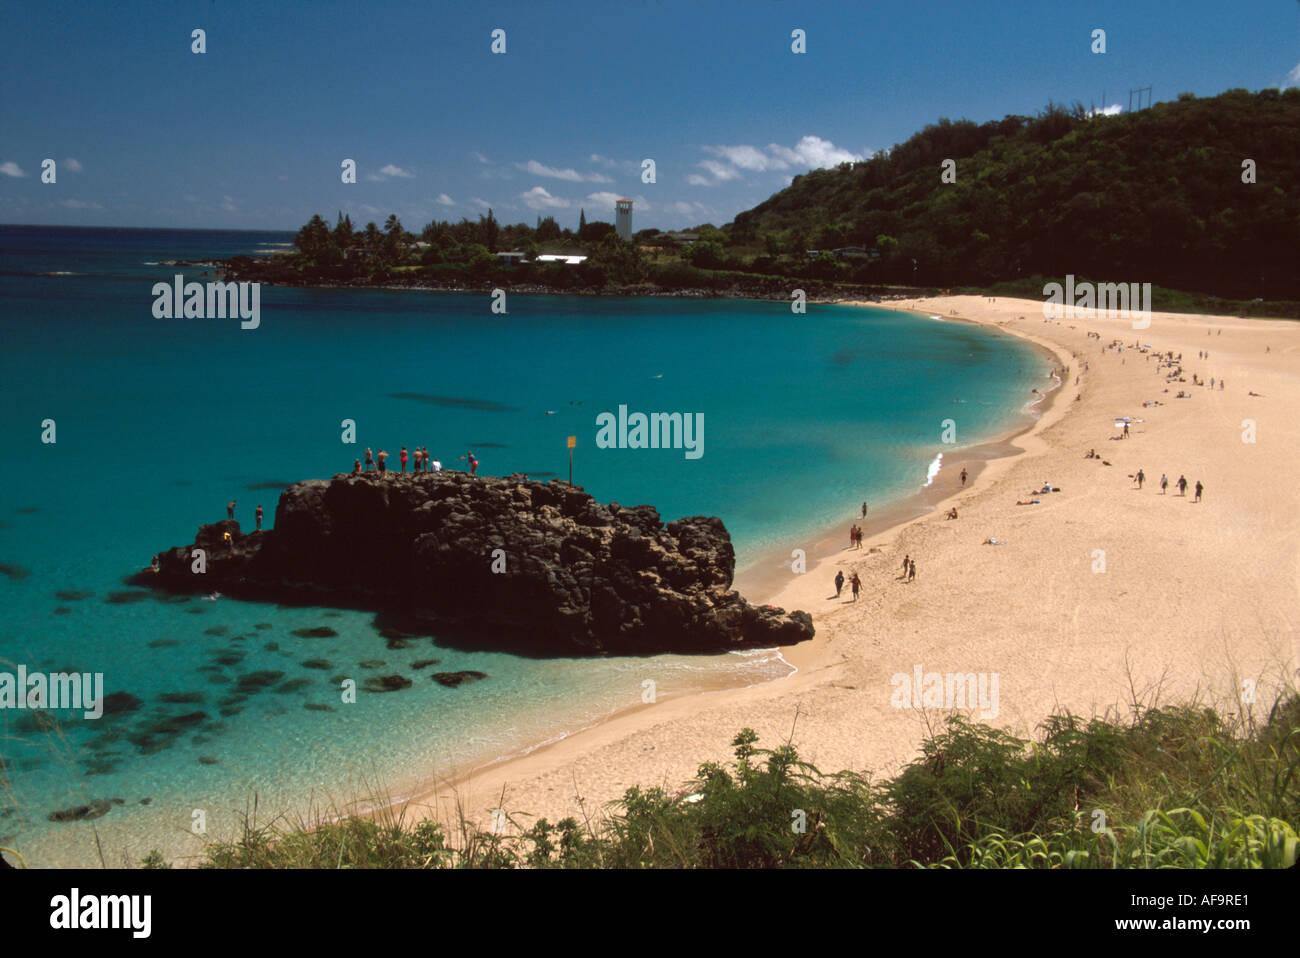 Hawaii Hawaiian Islands Oahu North Shore Waimea Bay Beach Park Sandy Lava Cliffs